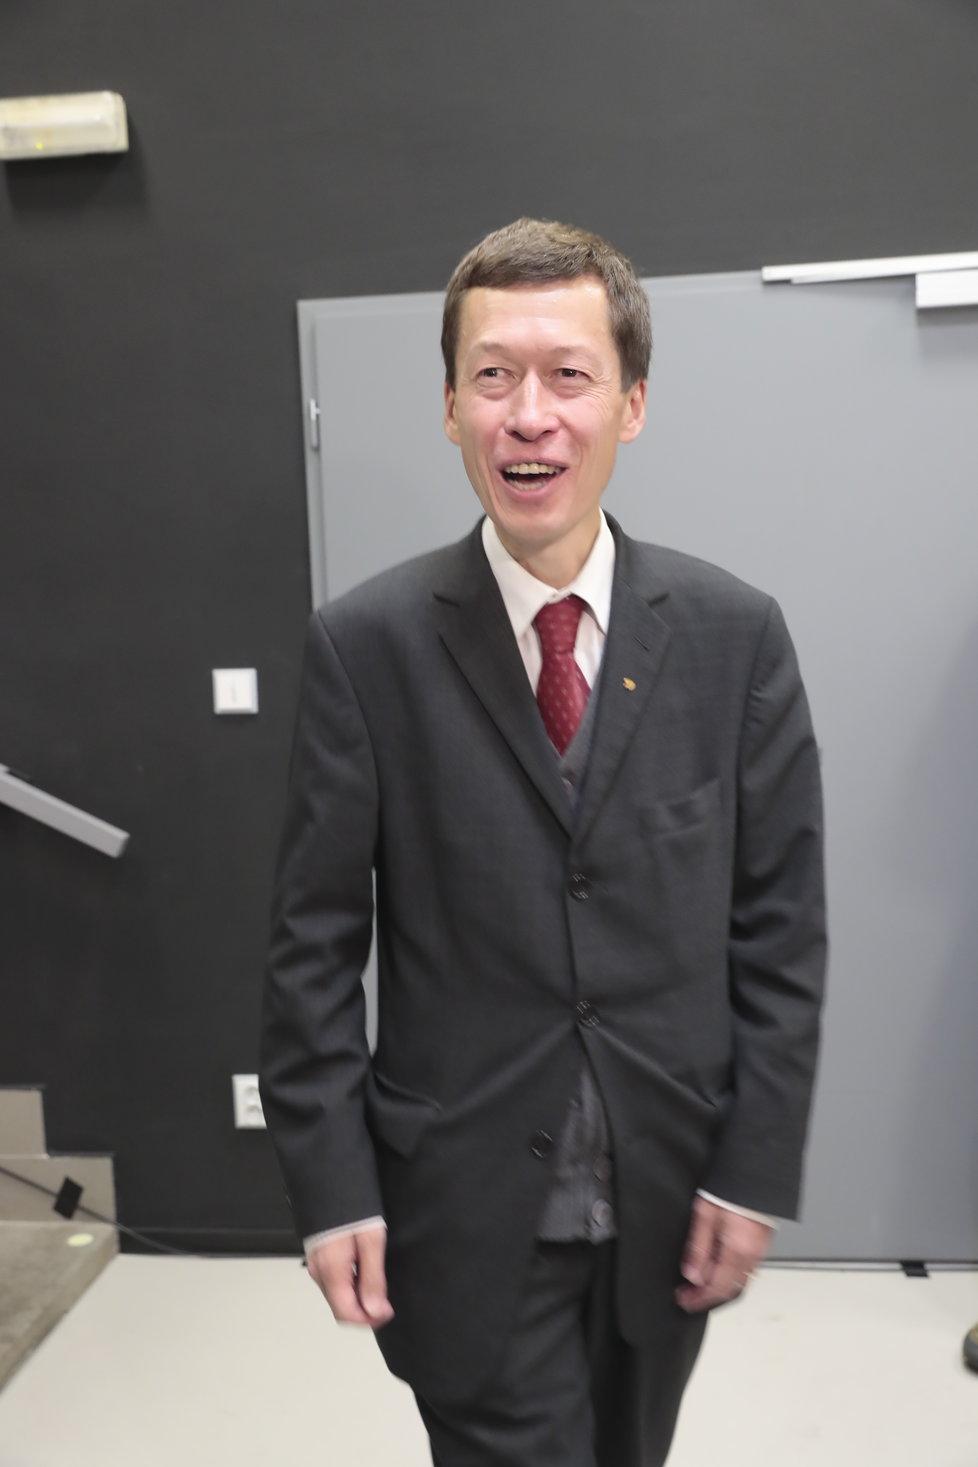 Volby 2018, KDU-ČSL: Do volebního štábu dorazil kandidát do Senátu Hayato Okamura